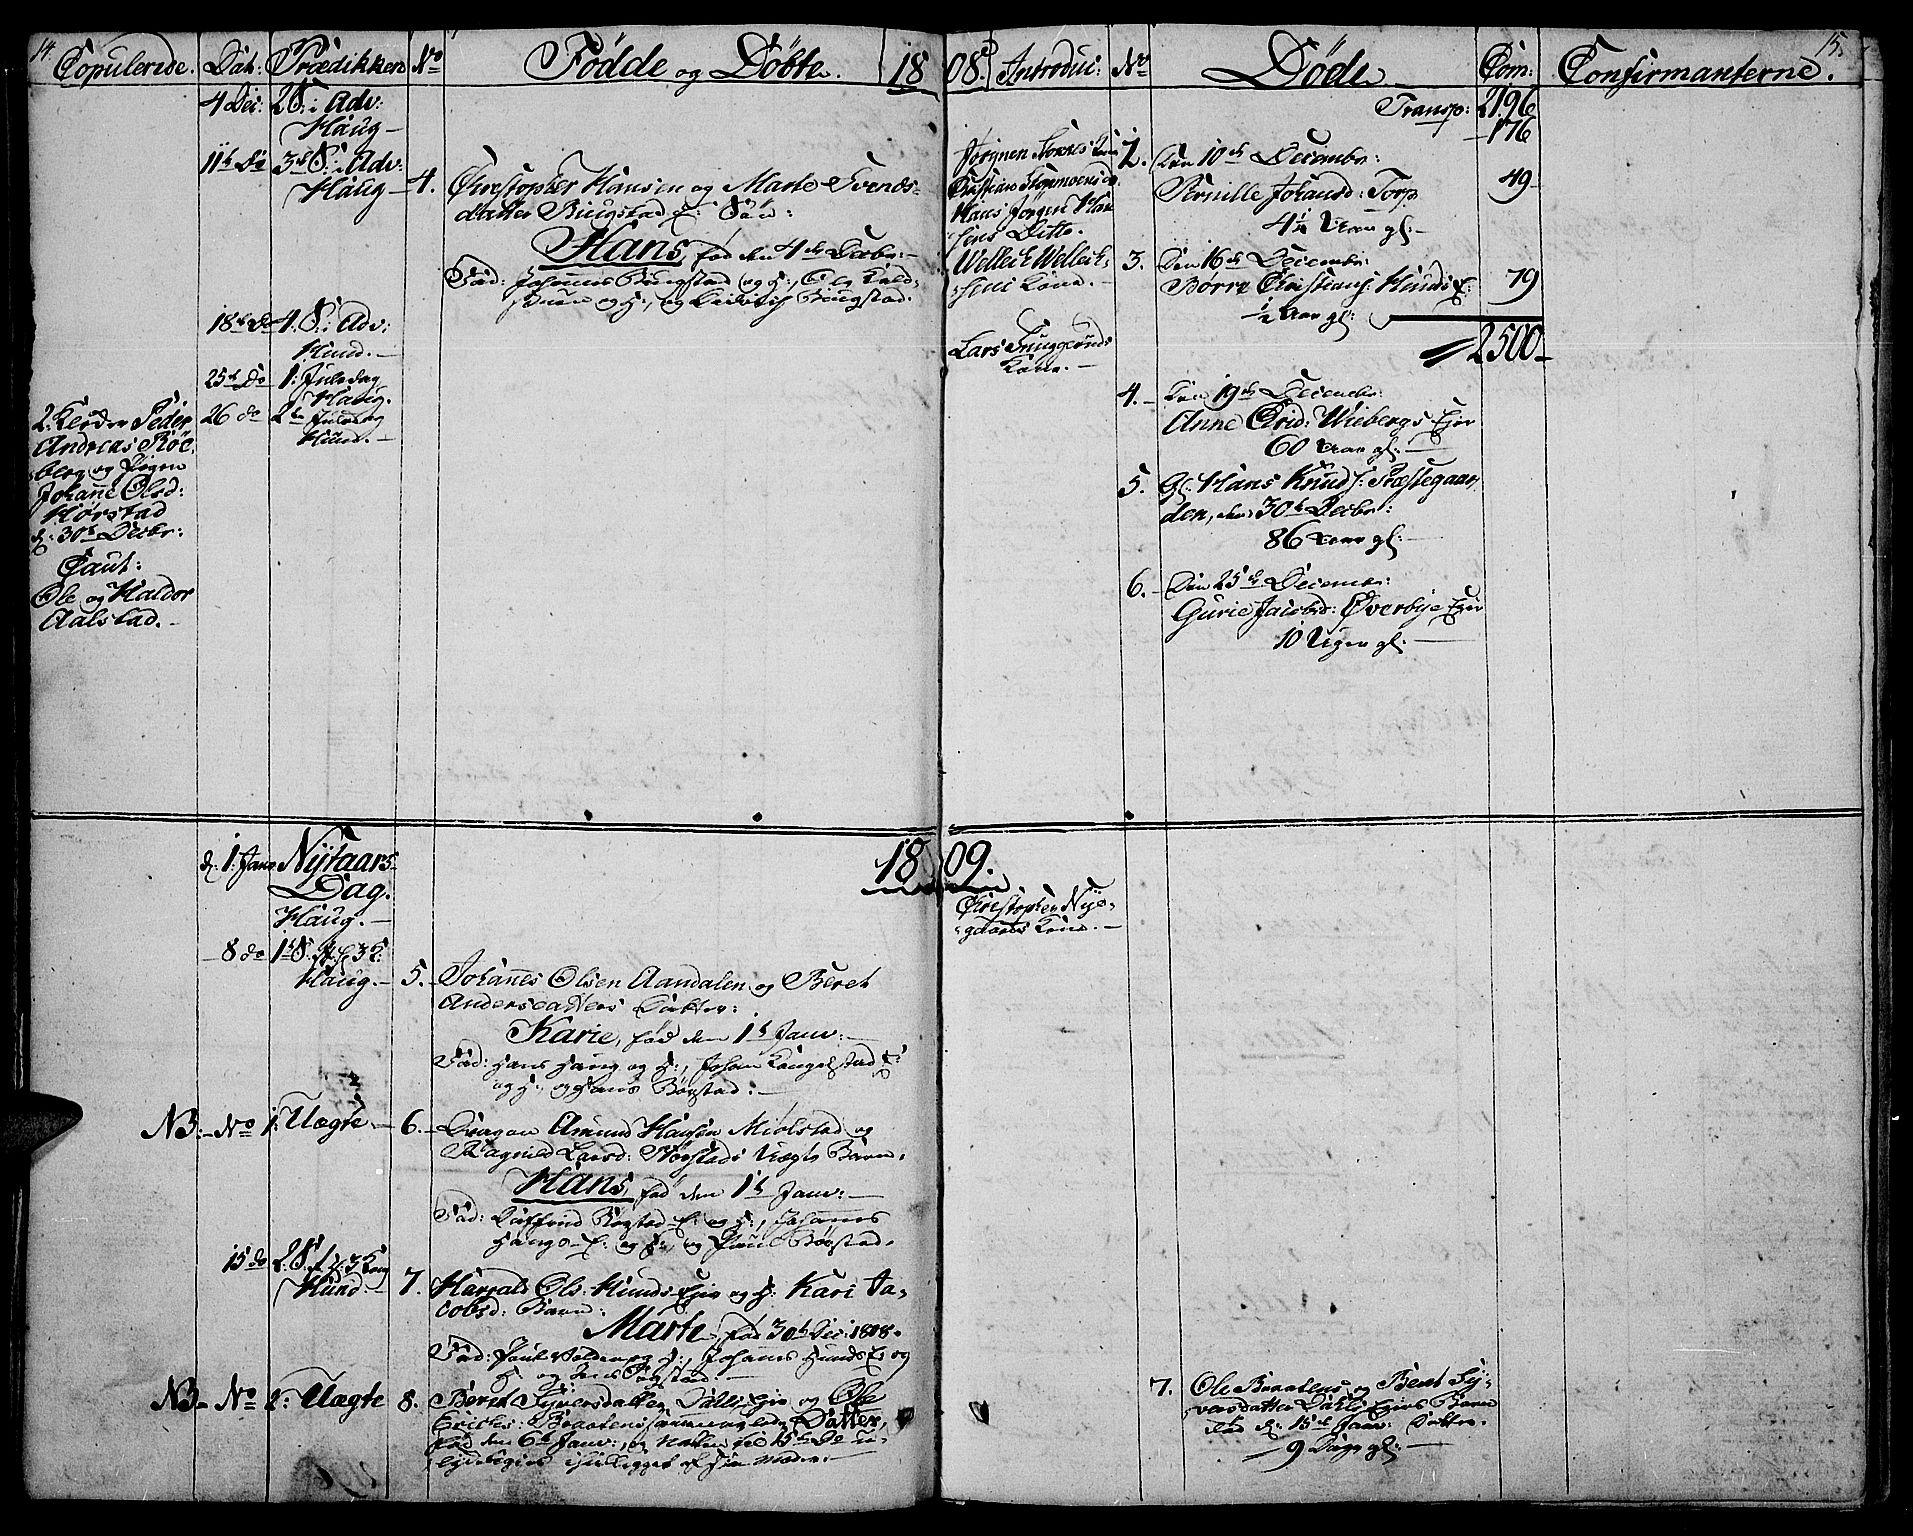 SAH, Vardal prestekontor, H/Ha/Haa/L0003: Ministerialbok nr. 3, 1808-1814, s. 14-15